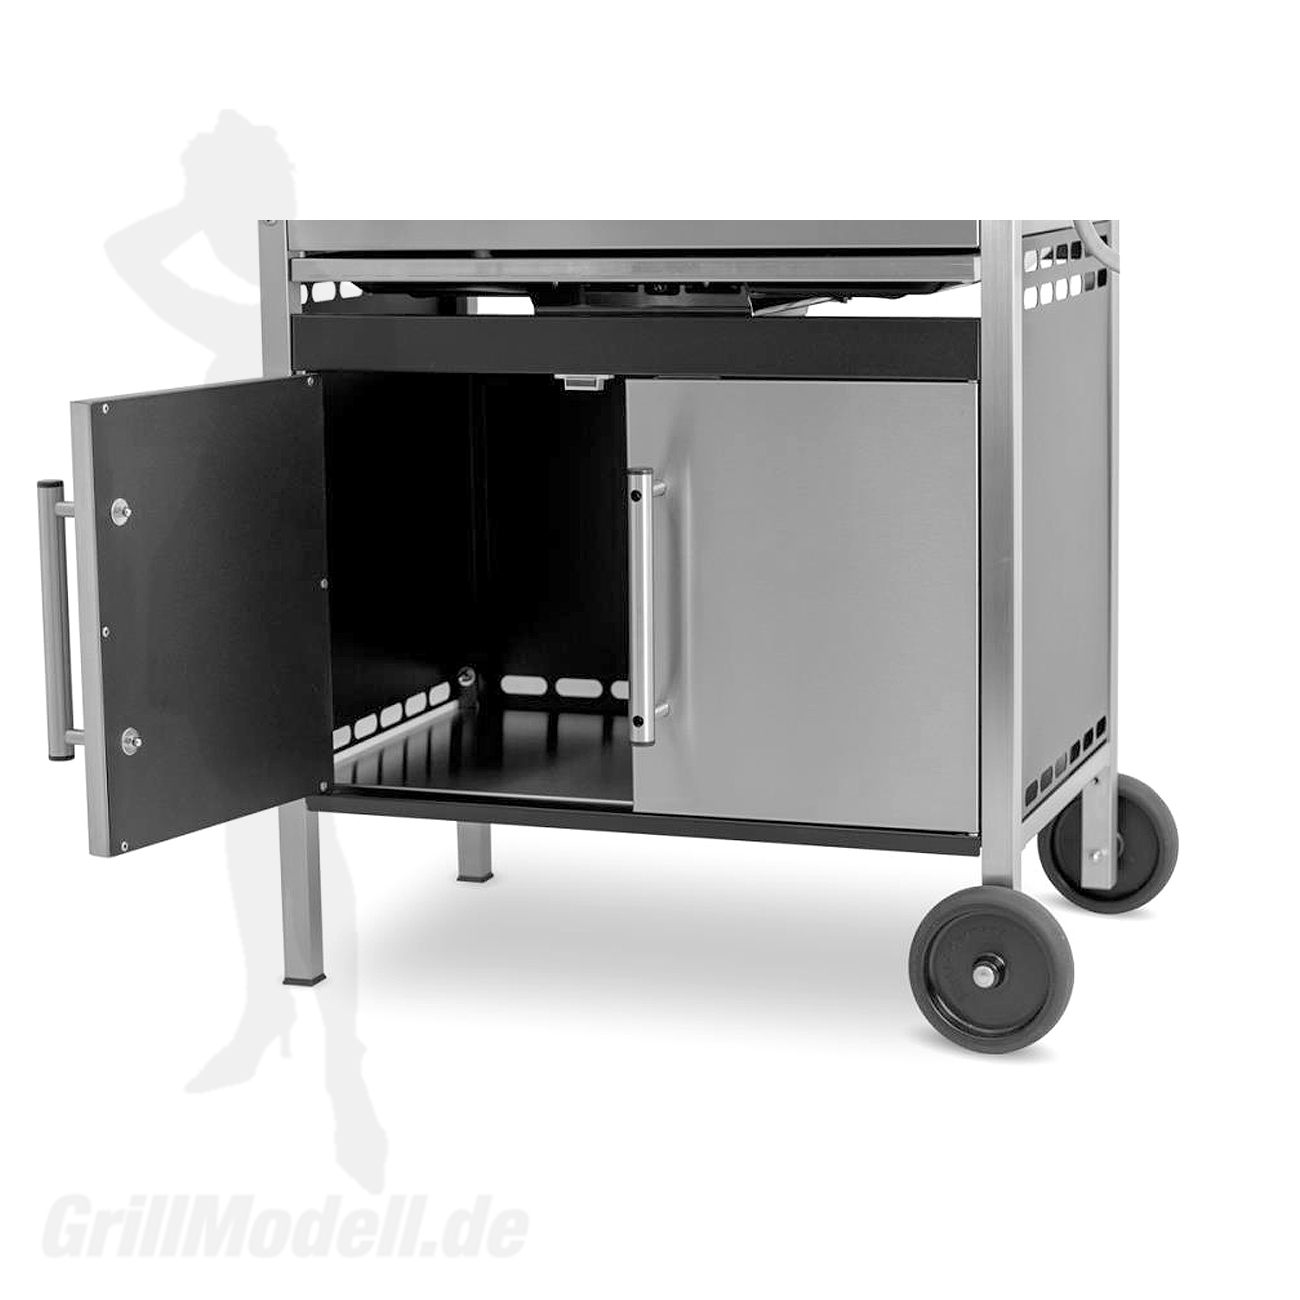 Unterschrank für Edelstahlgrill Holzkohlegrill Edelstar L 2 türig